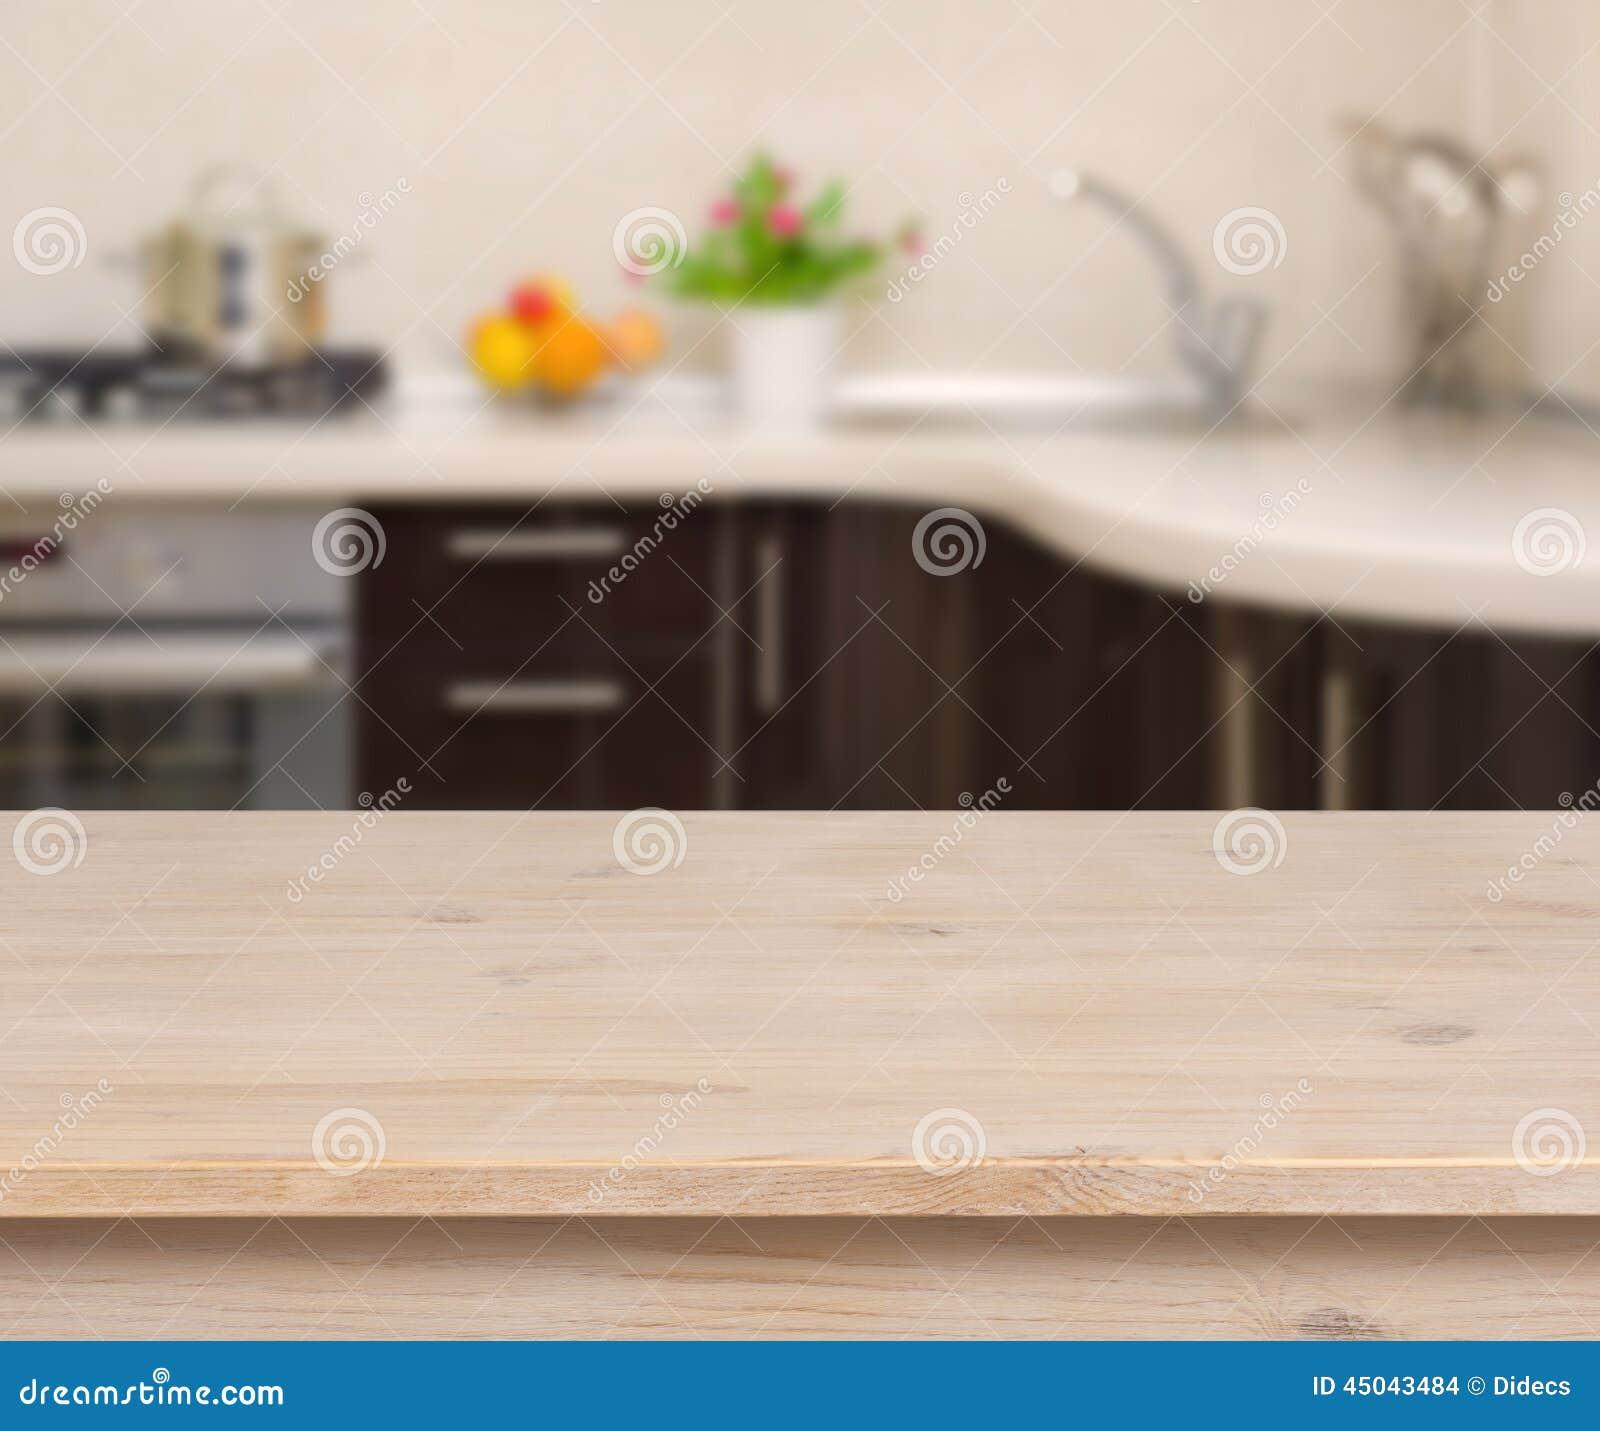 Таблица завтрака на предпосылке интерьера кухни